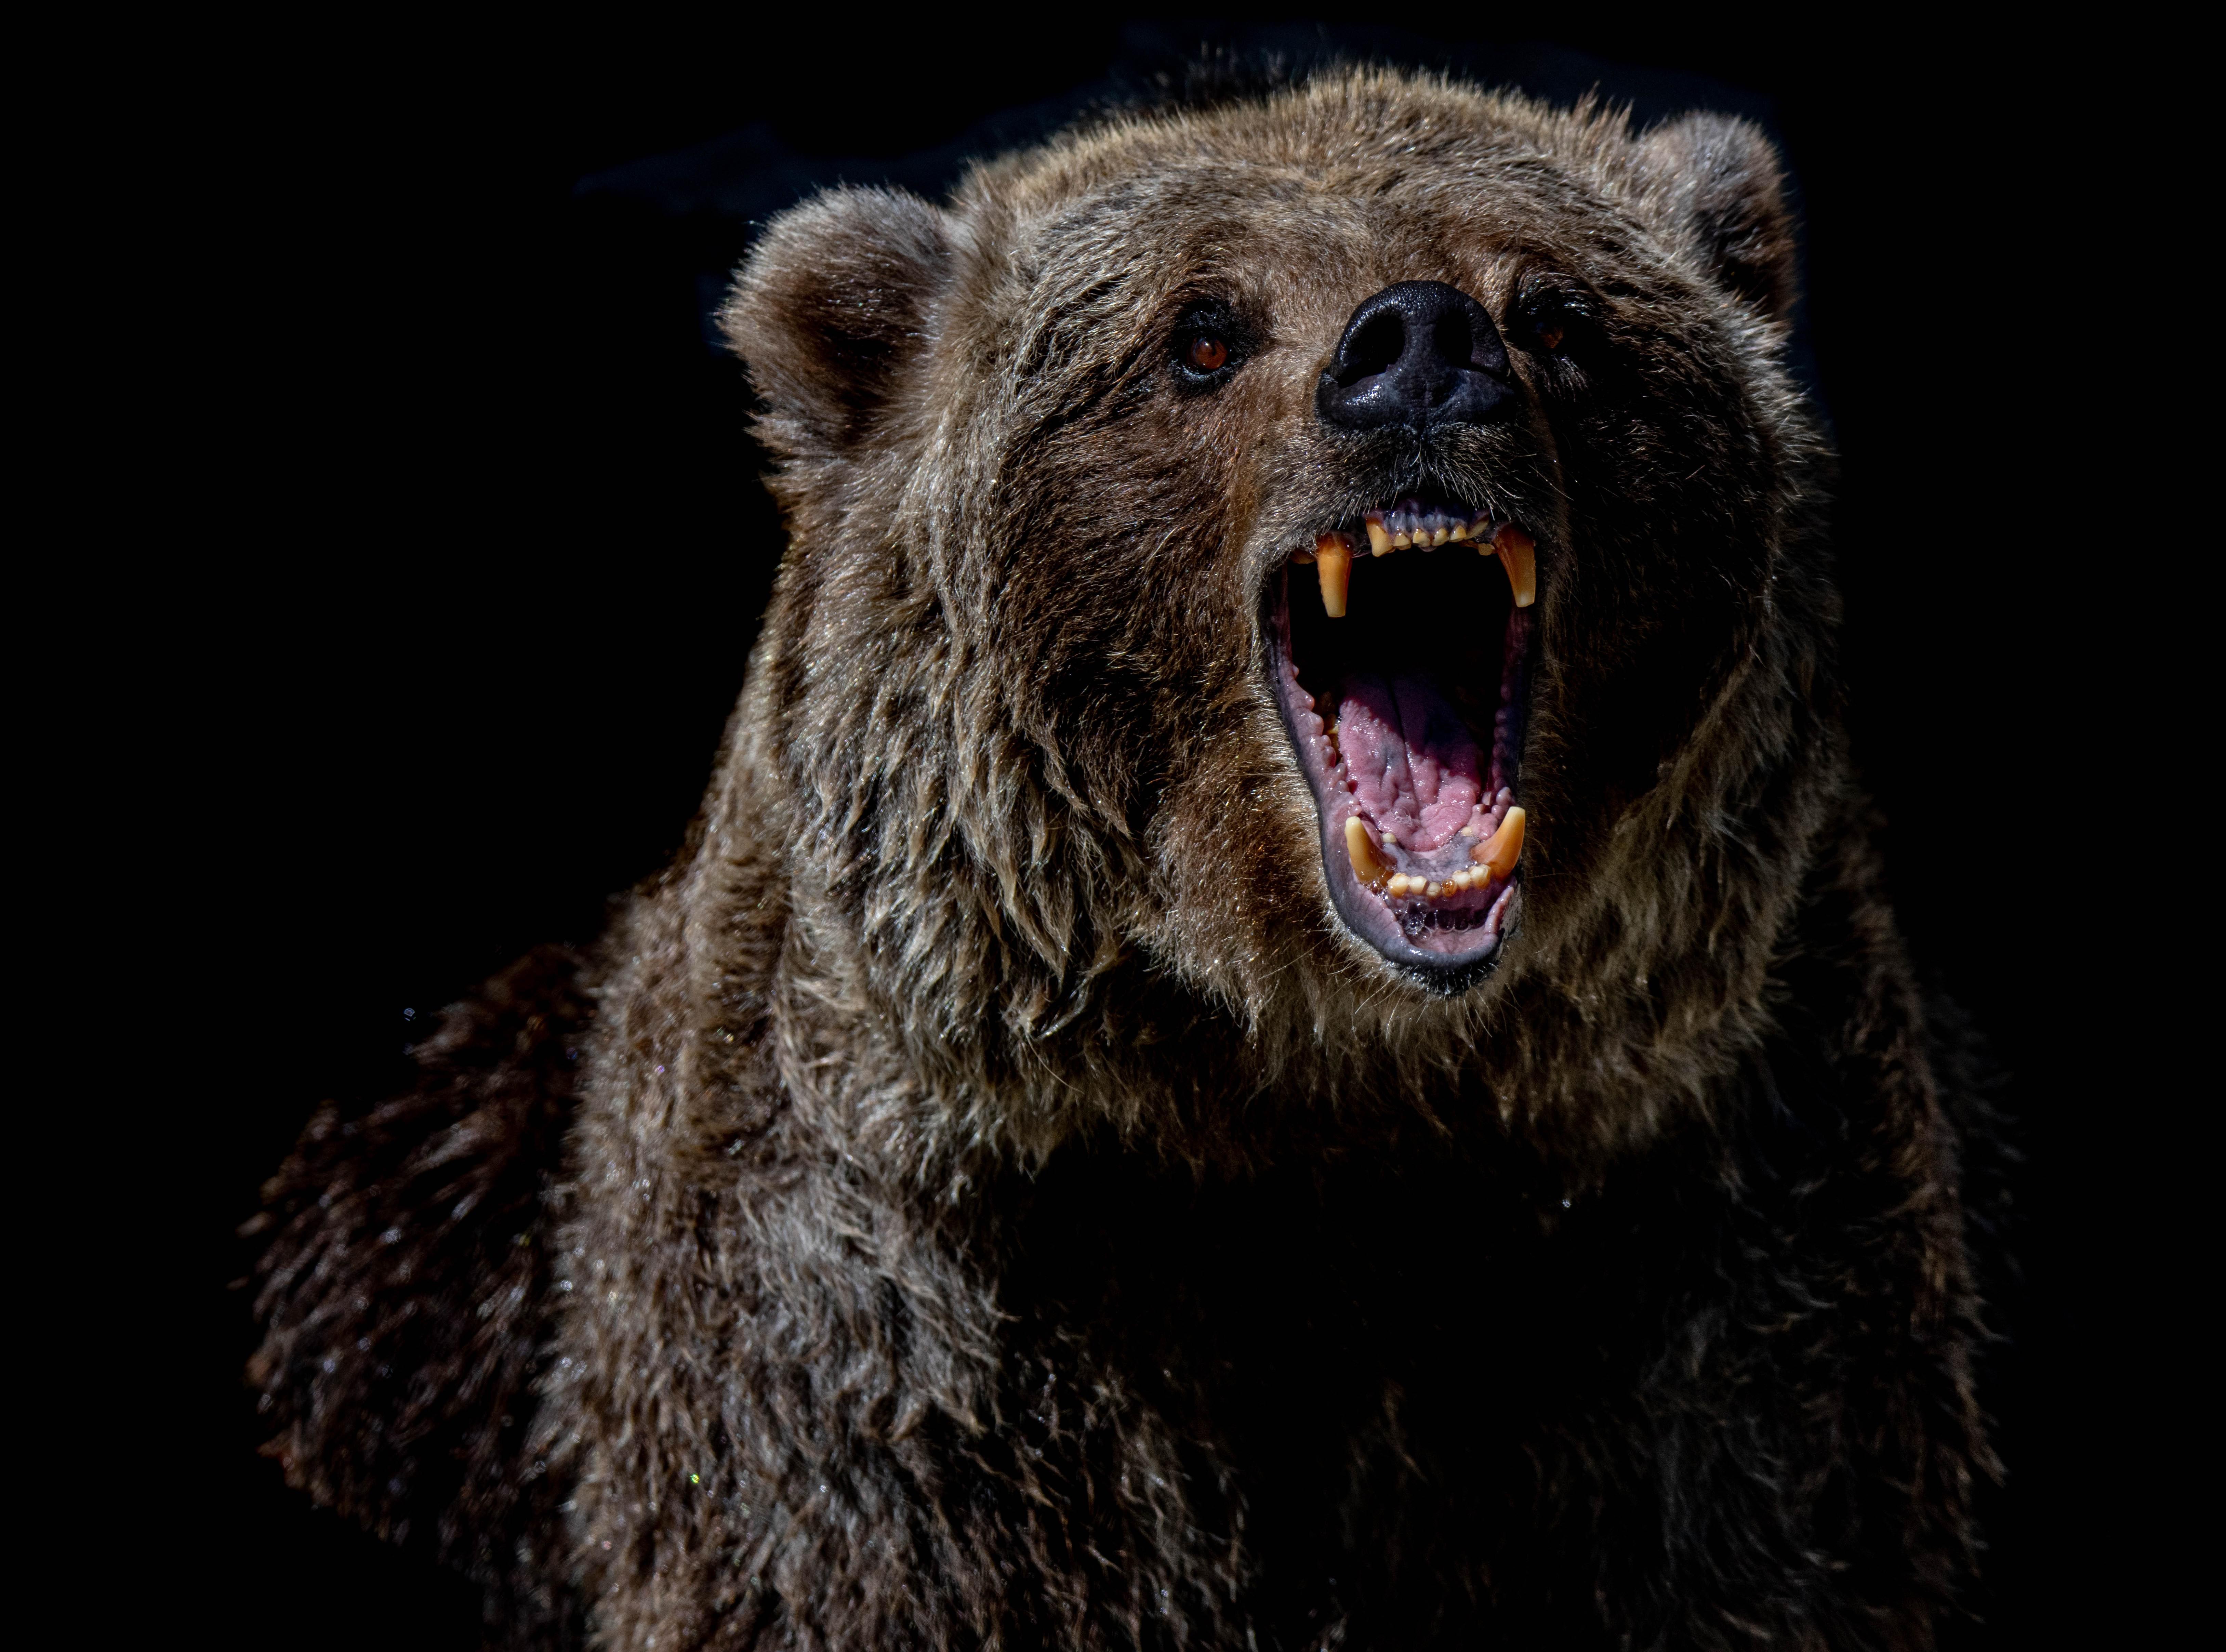 Bitcoin Bearish Signals Go Off Despite Recovery Above $44k, Dead Cat's Bounce?